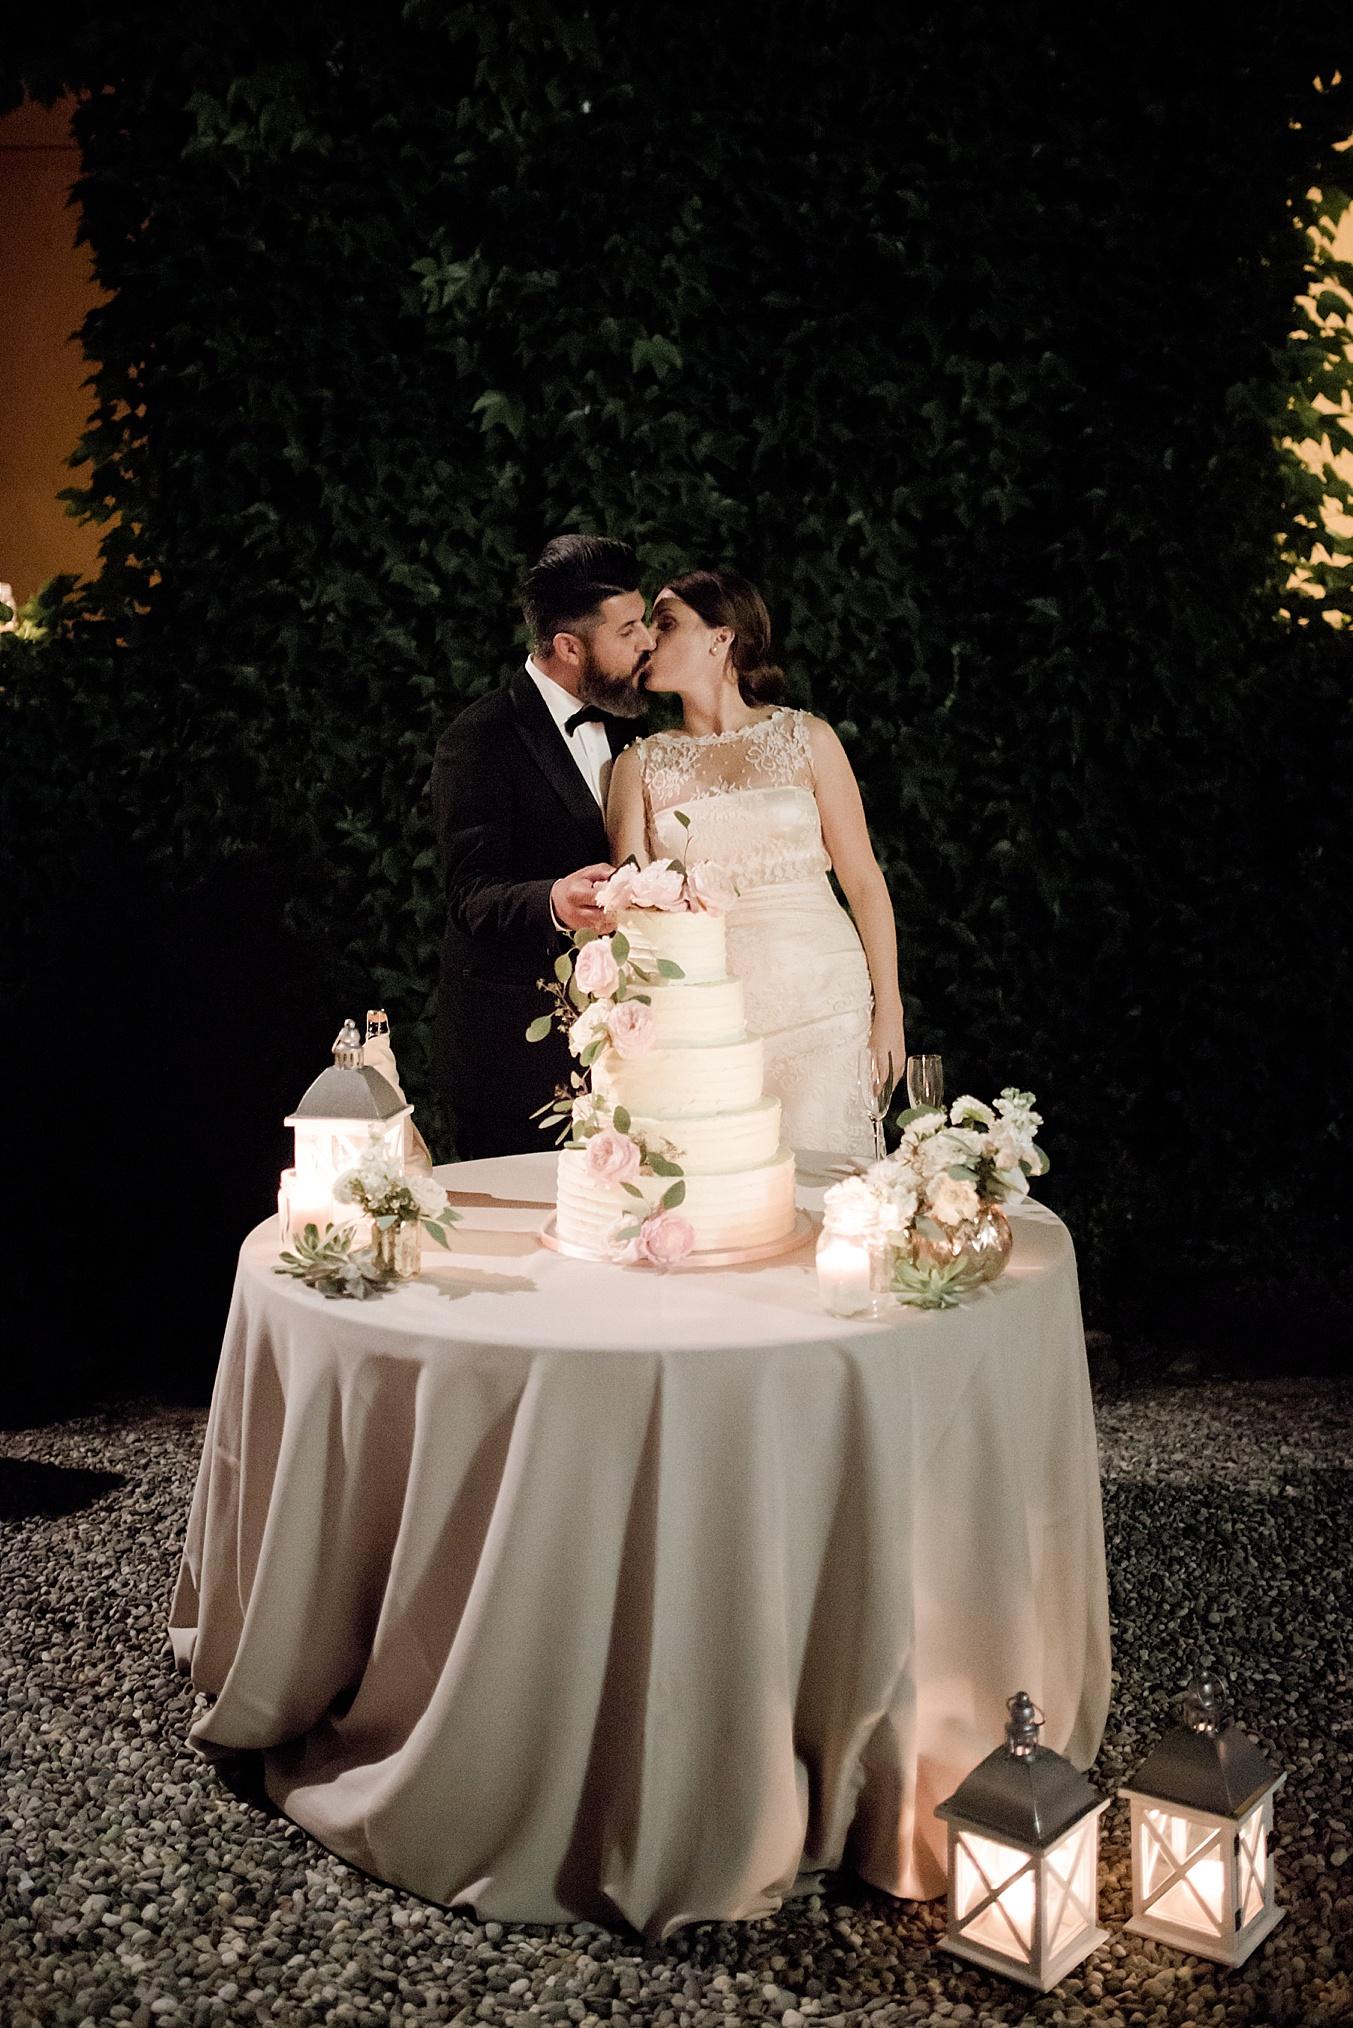 chic elegant wedding Italy cake cutting